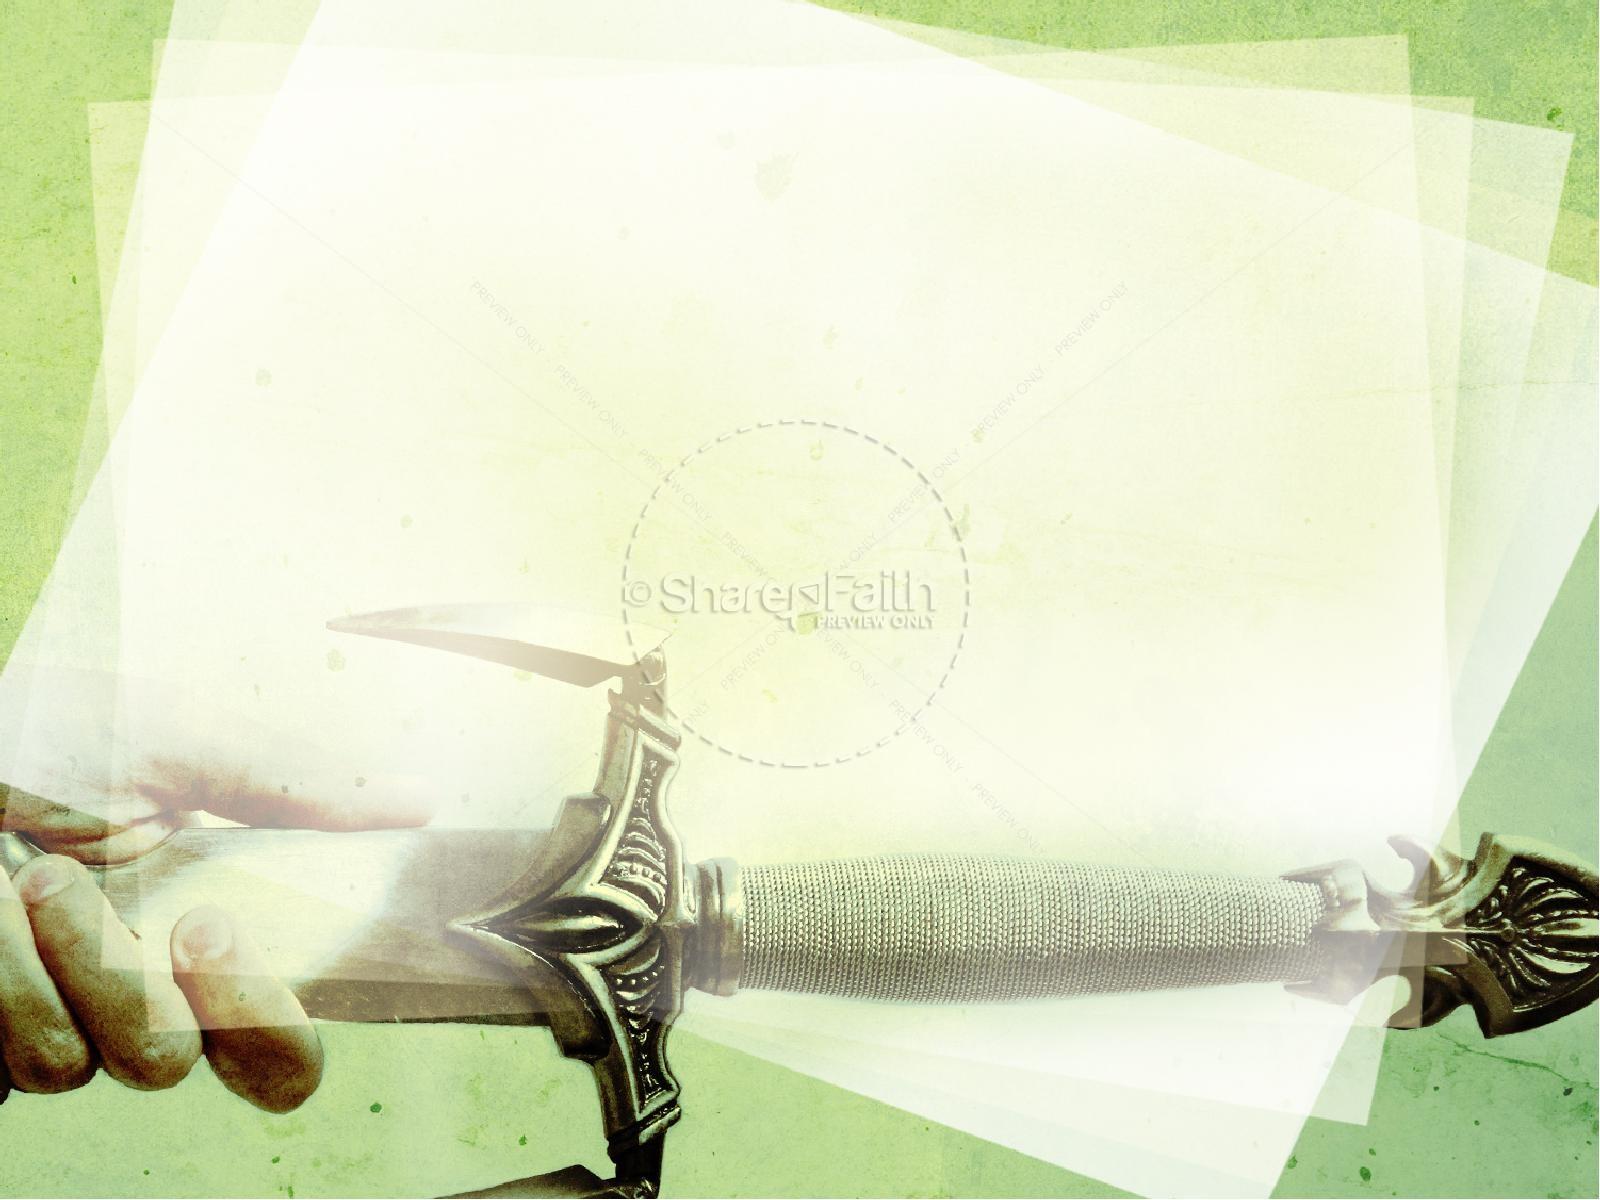 the sword powerpoint sermon